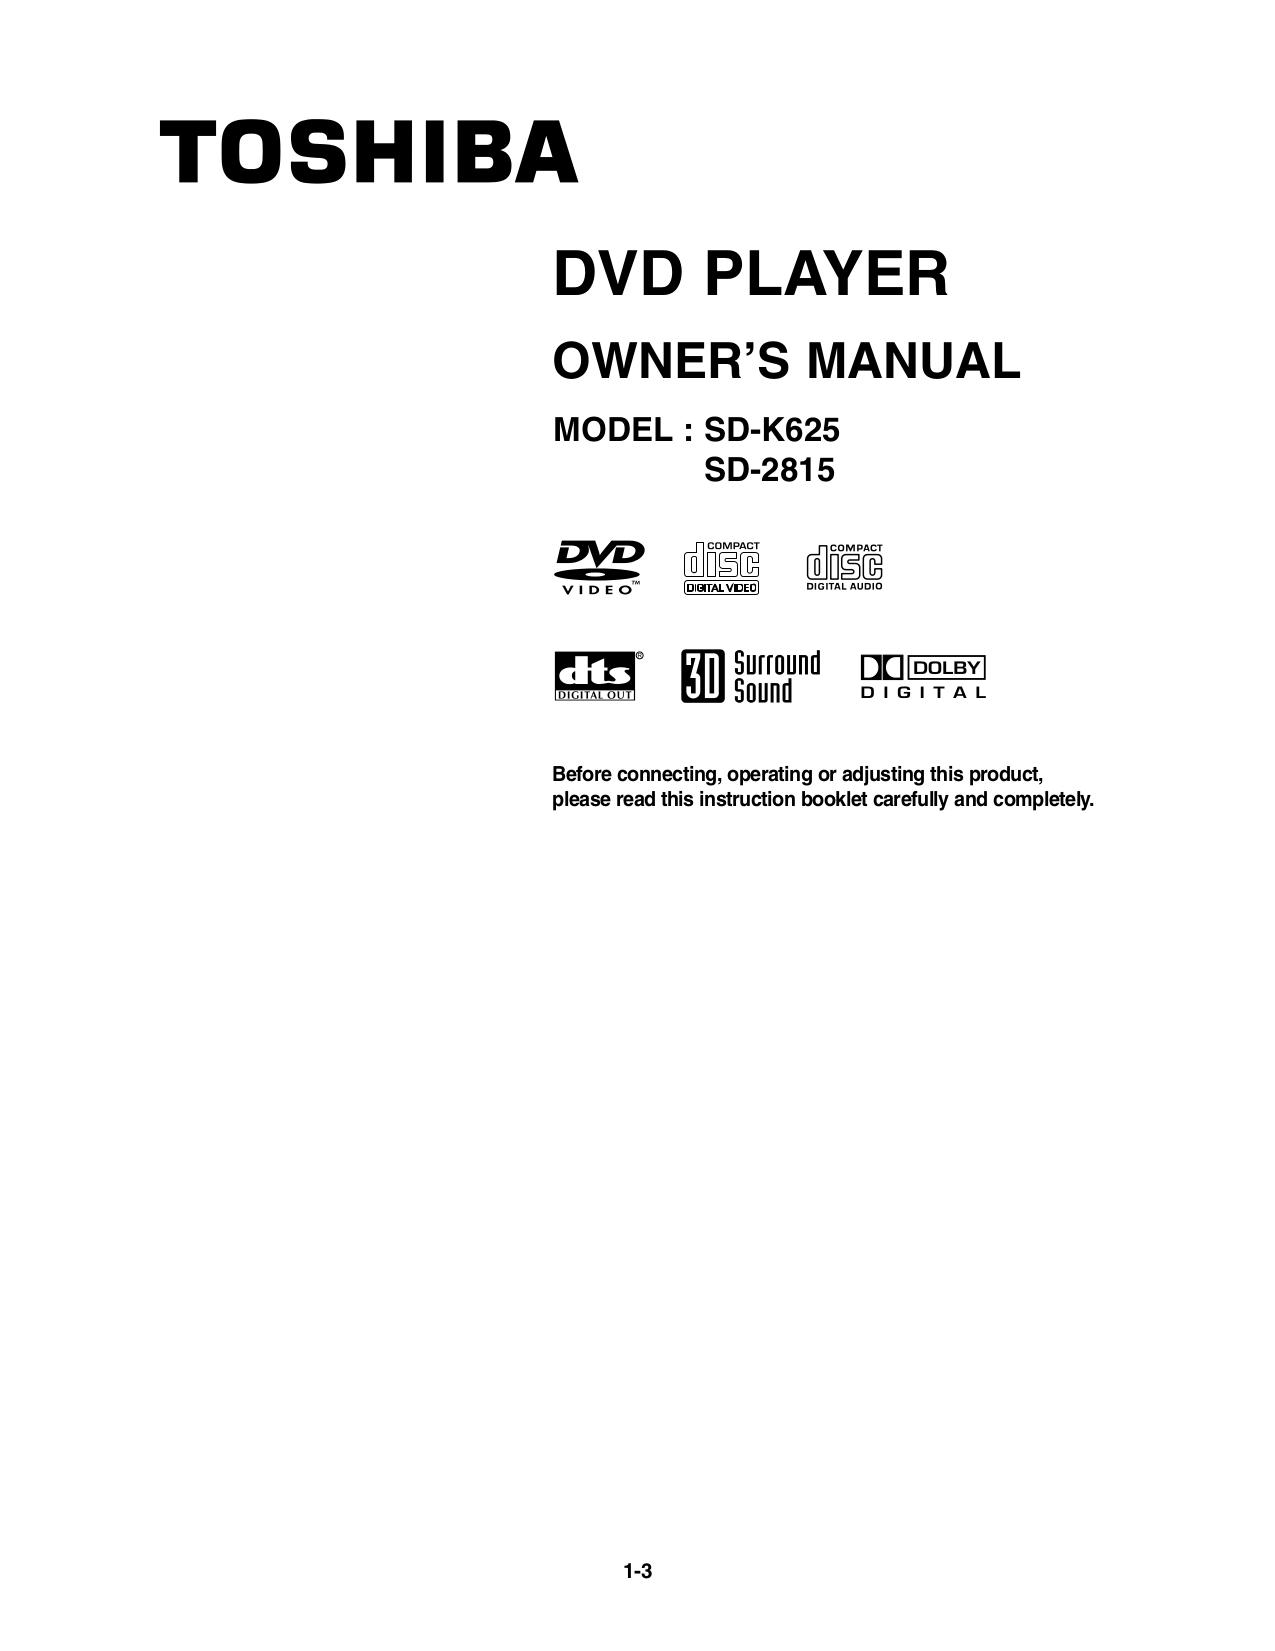 download free pdf for toshiba sd 2815 dvd players manual rh umlib com Toshiba Instruction Manual Toshiba Instruction Manual